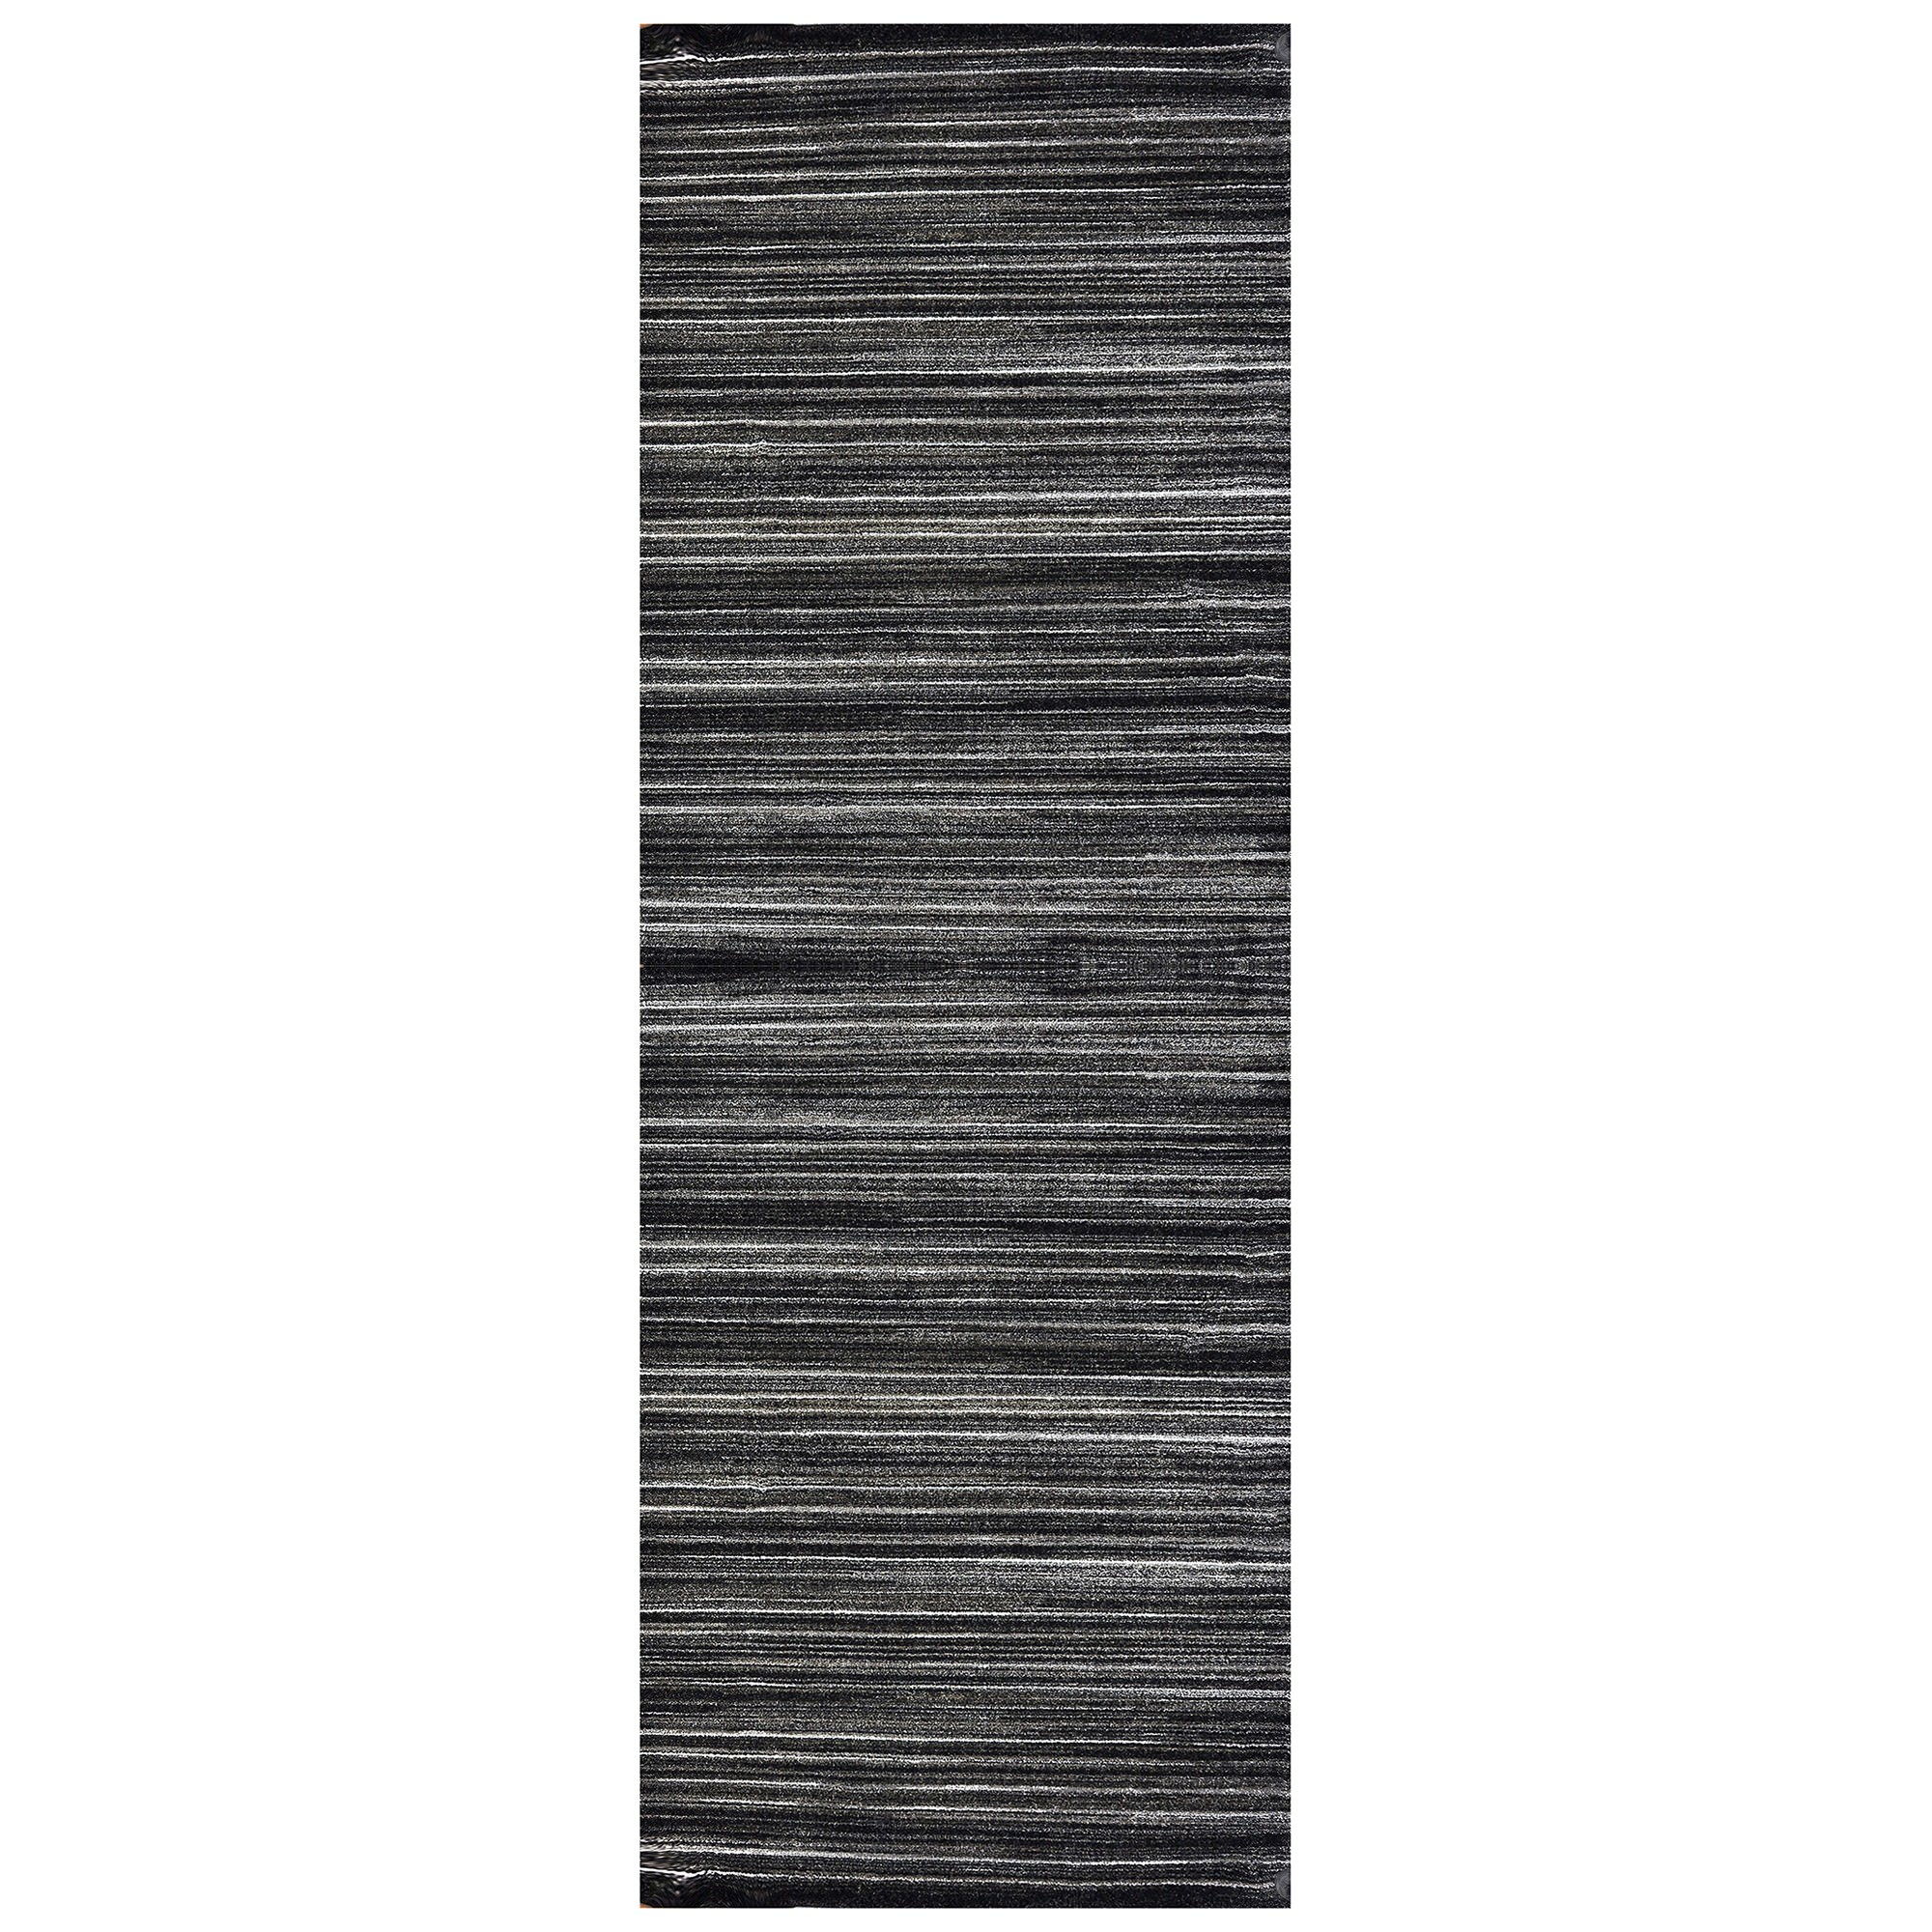 Studio Kermit Turkish Made Runner Rug, 300x80cm, Black